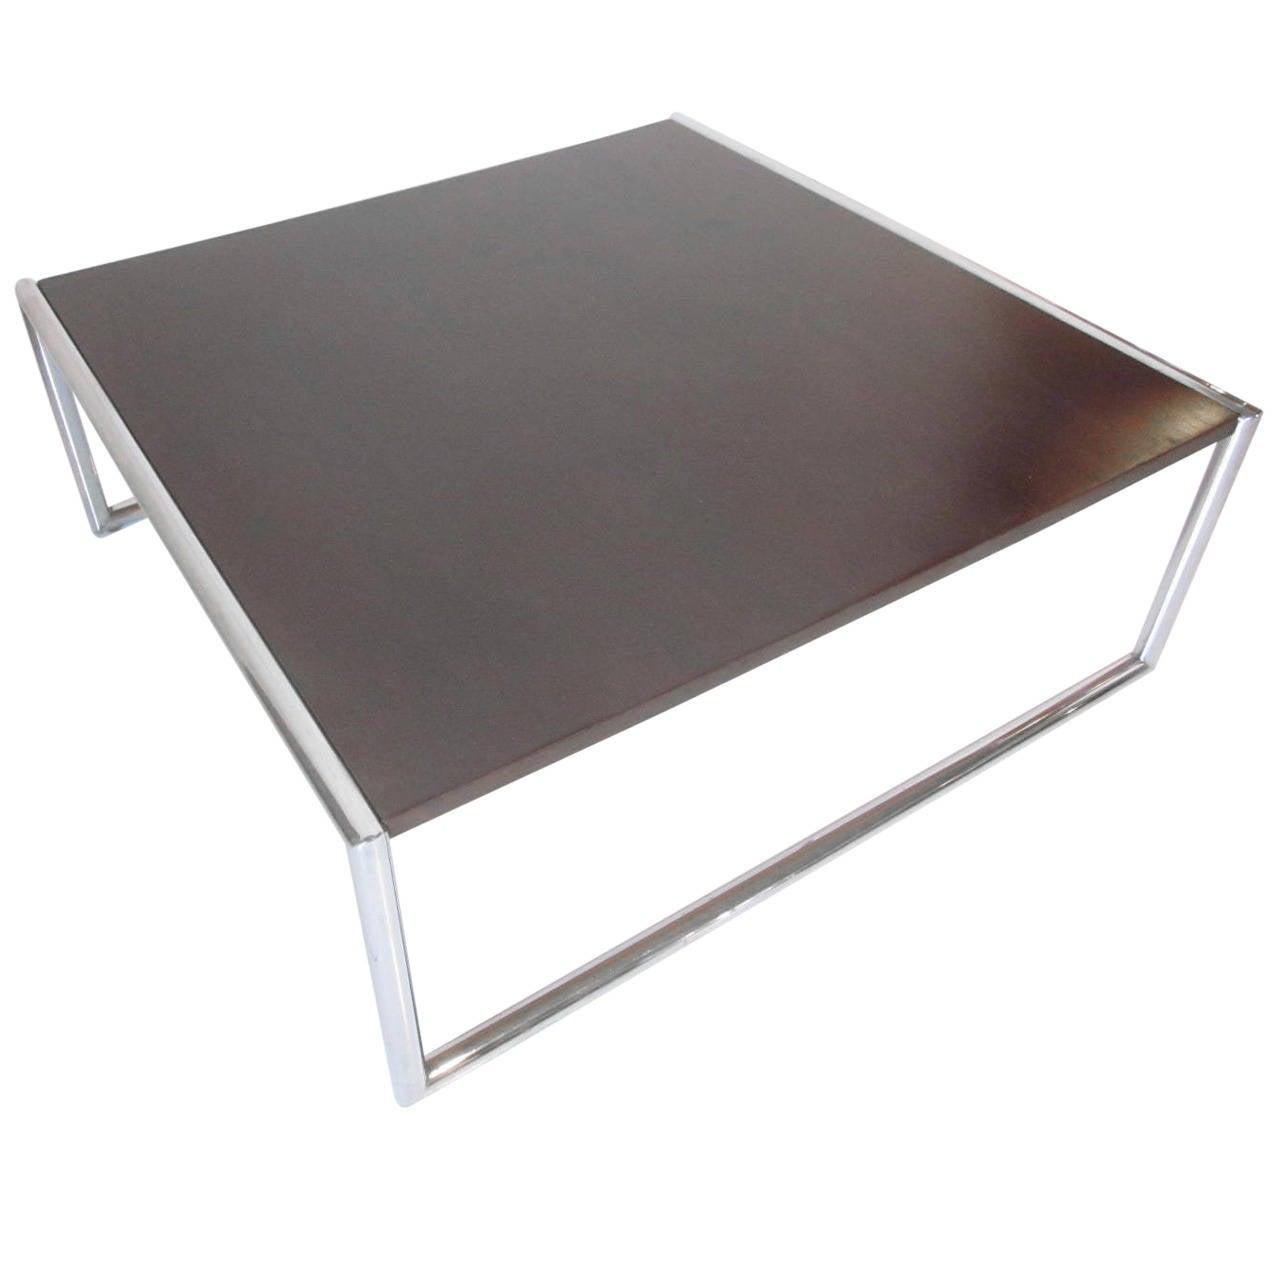 Milo Baughman Style Chrome and Ebony Coffee Table